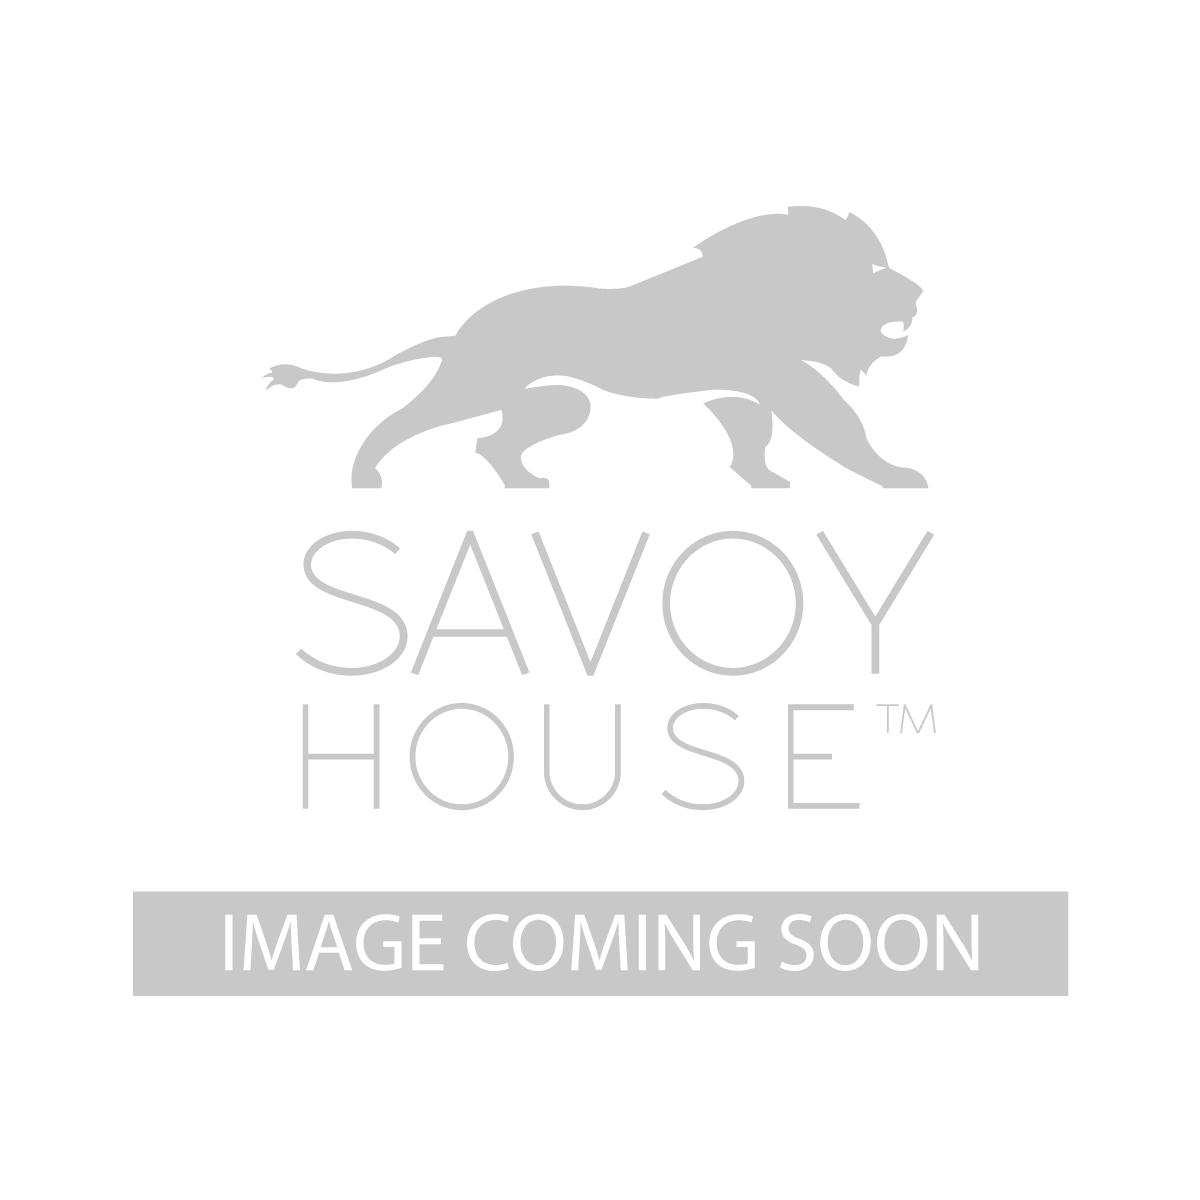 8 1062 3 13 Brunswick 3 Light Bath Bar By Savoy House